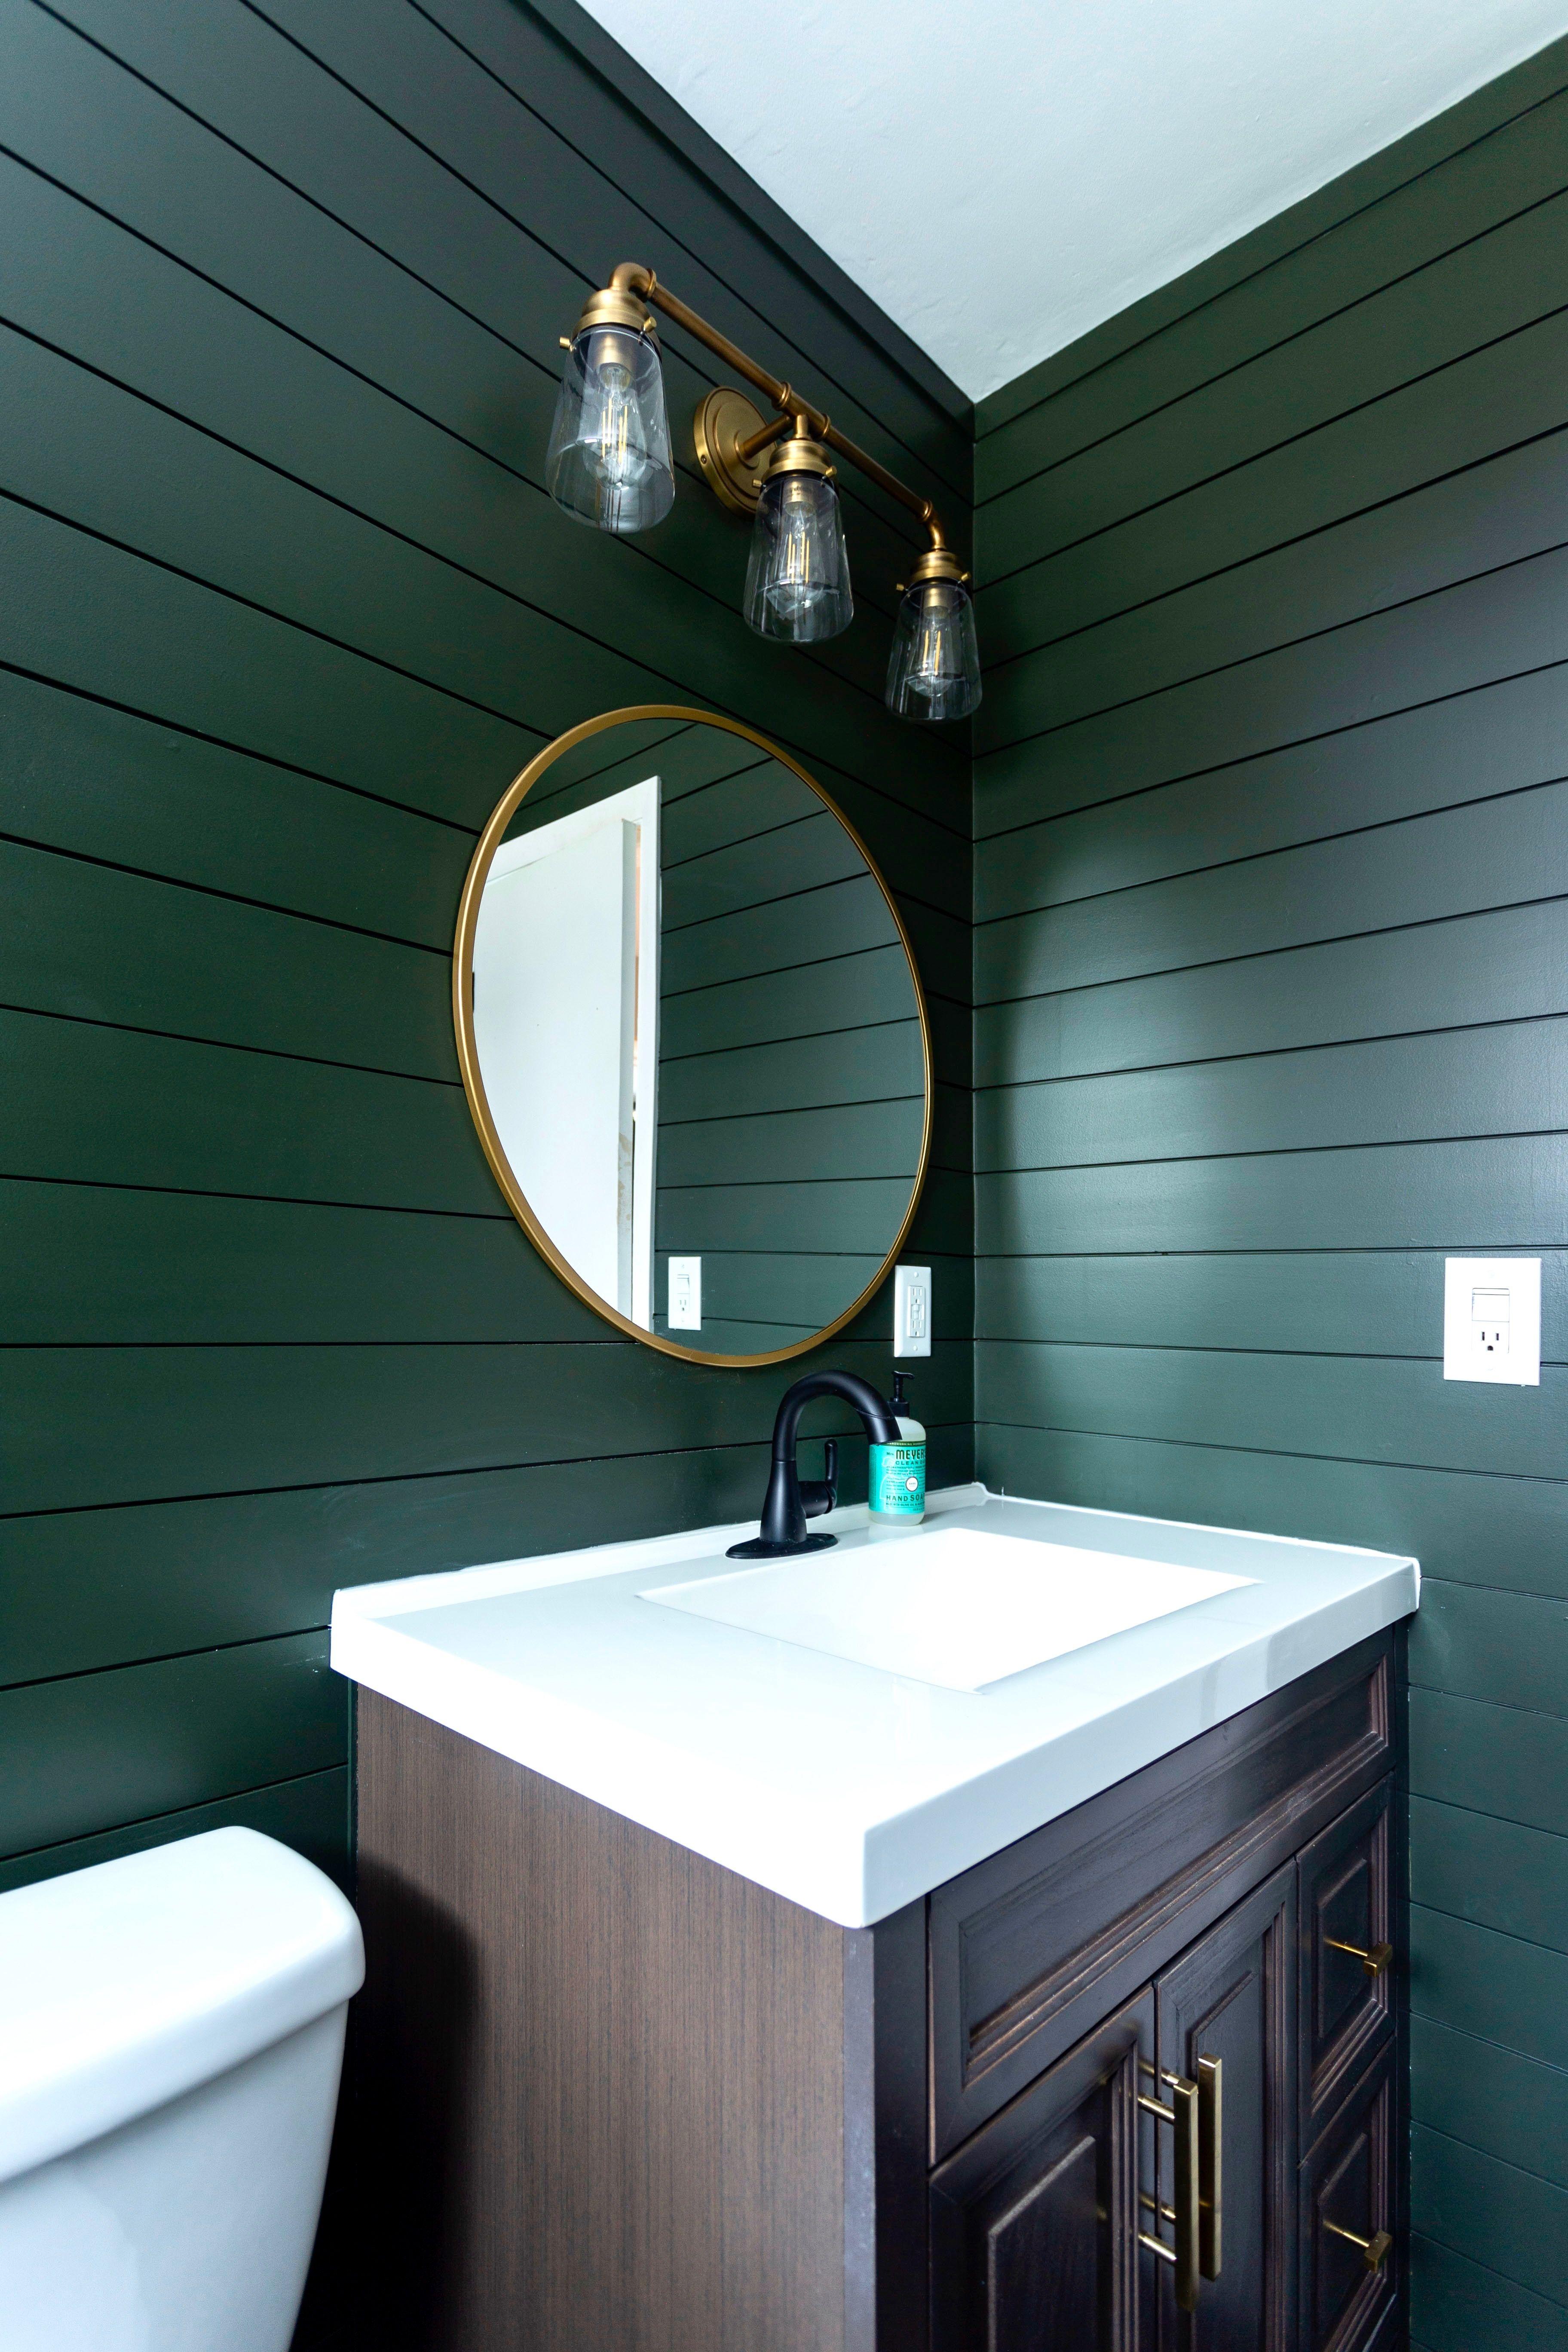 Dark Green And Gold Shiplap Bathroom In 2020 Shiplap Bathroom Green Accent Walls Dark Green Bathrooms